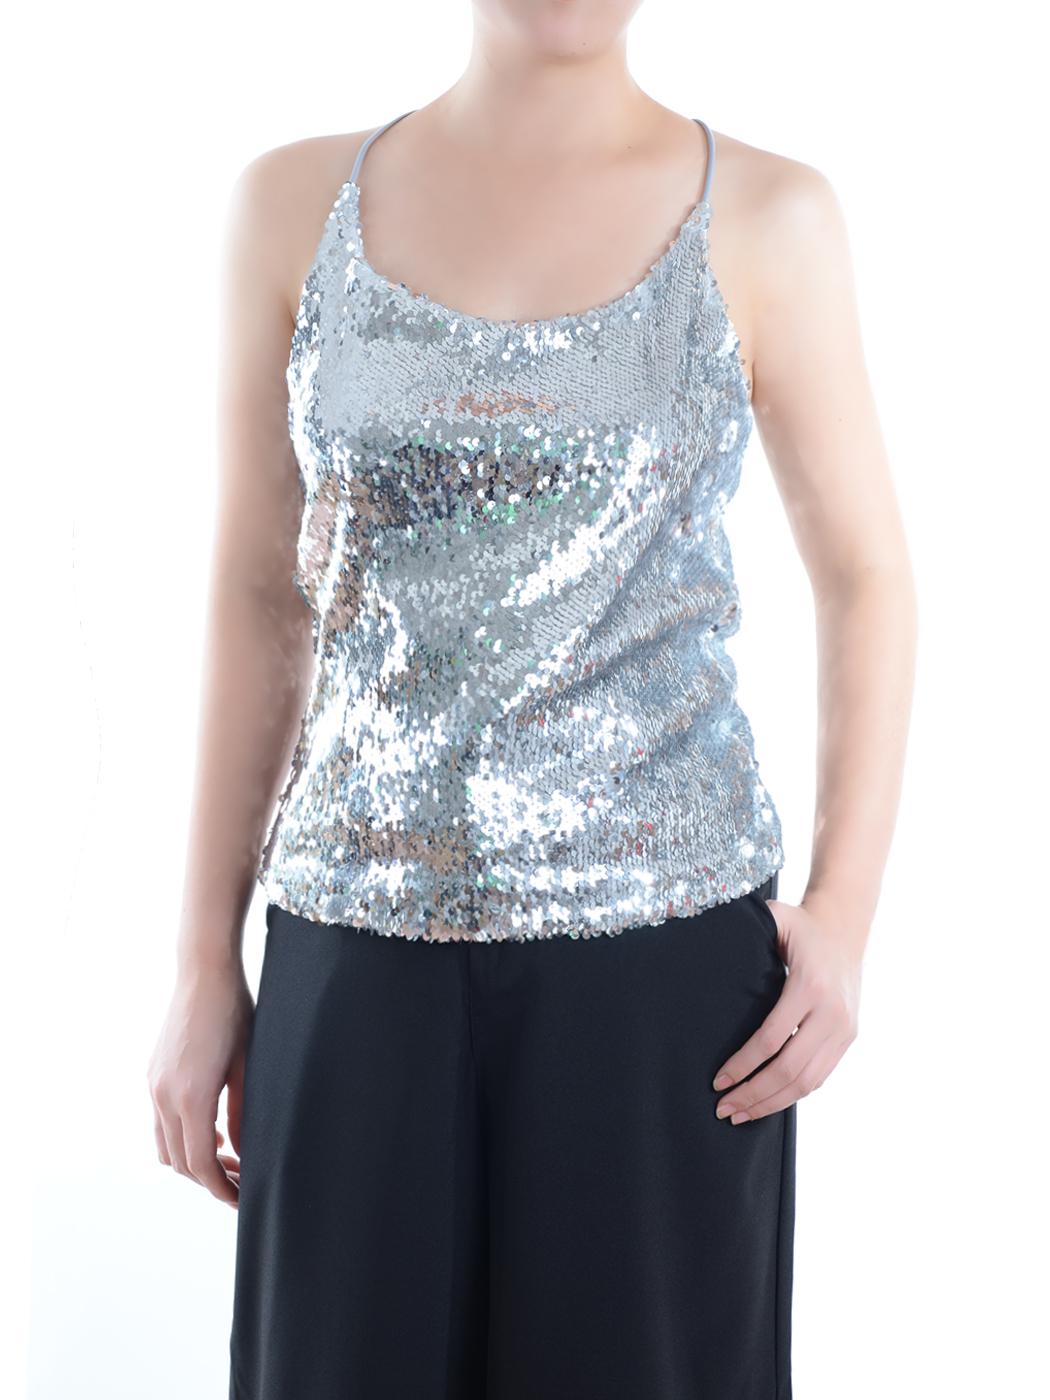 Anna-Kaci Summer Womens Vest Sequin Spaghetti Strap Crop Camisole Tank Top, Matte or Shiny 10 Color